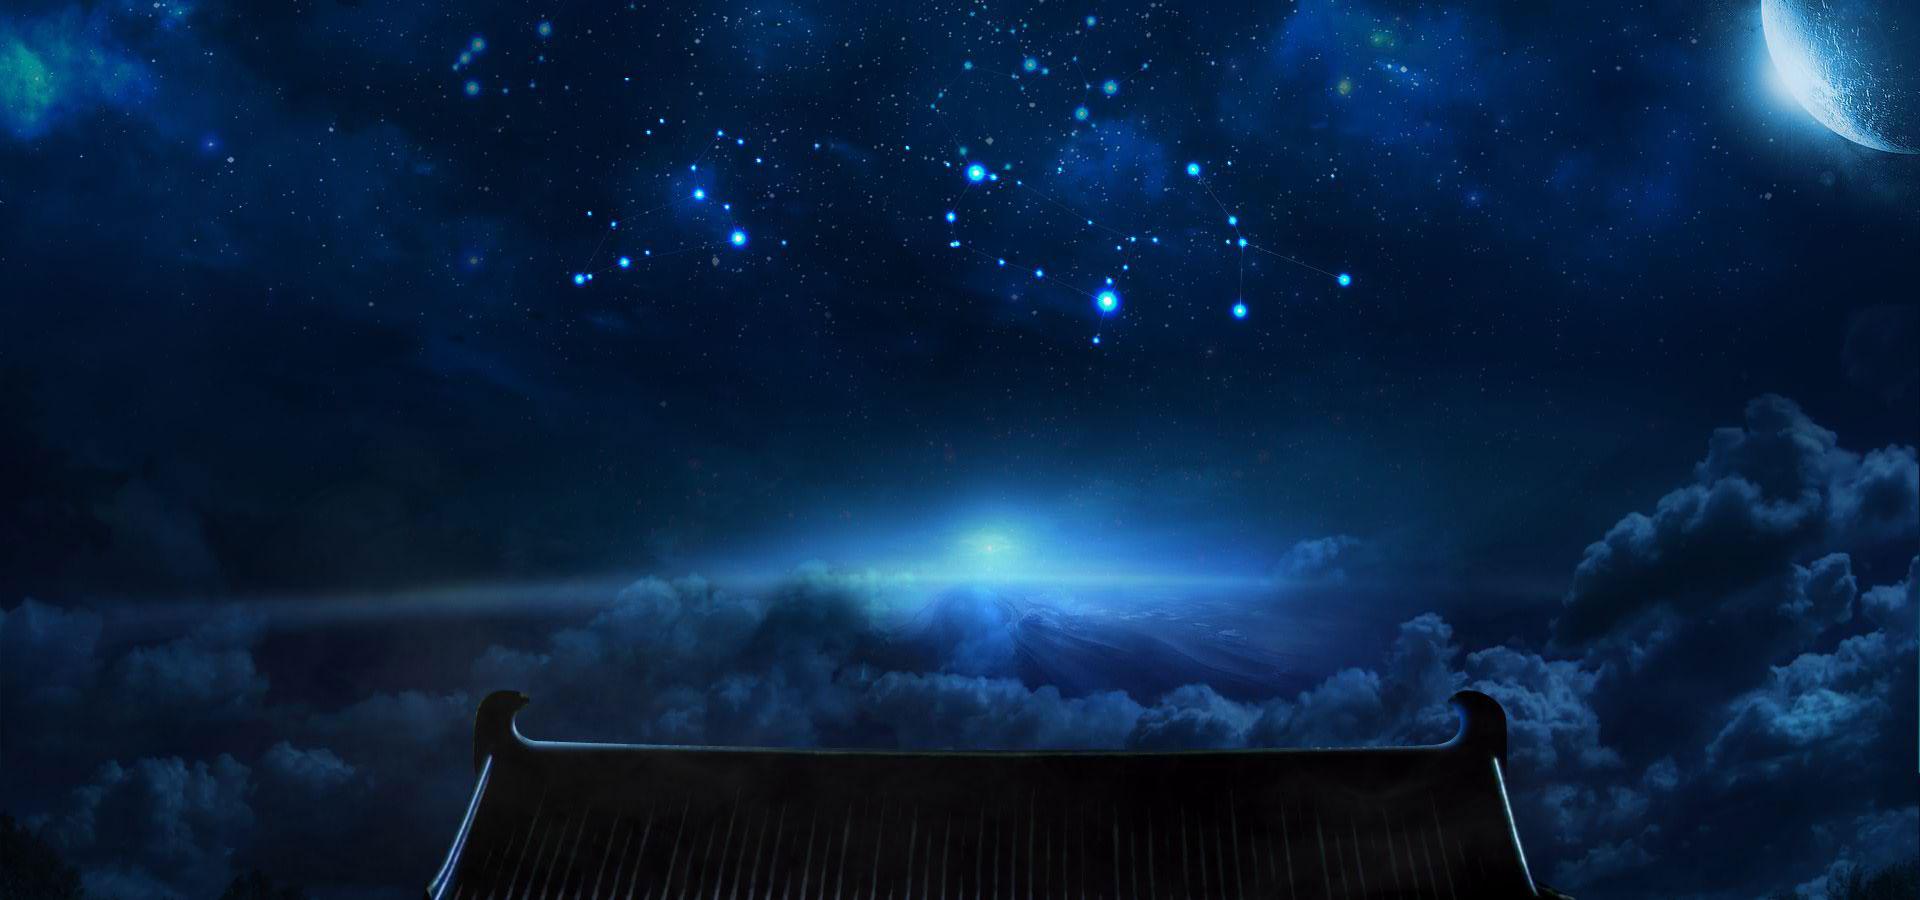 banni u00e8re de nuit myst u00e9rieuse de fond la nuit myst u00e9rieux